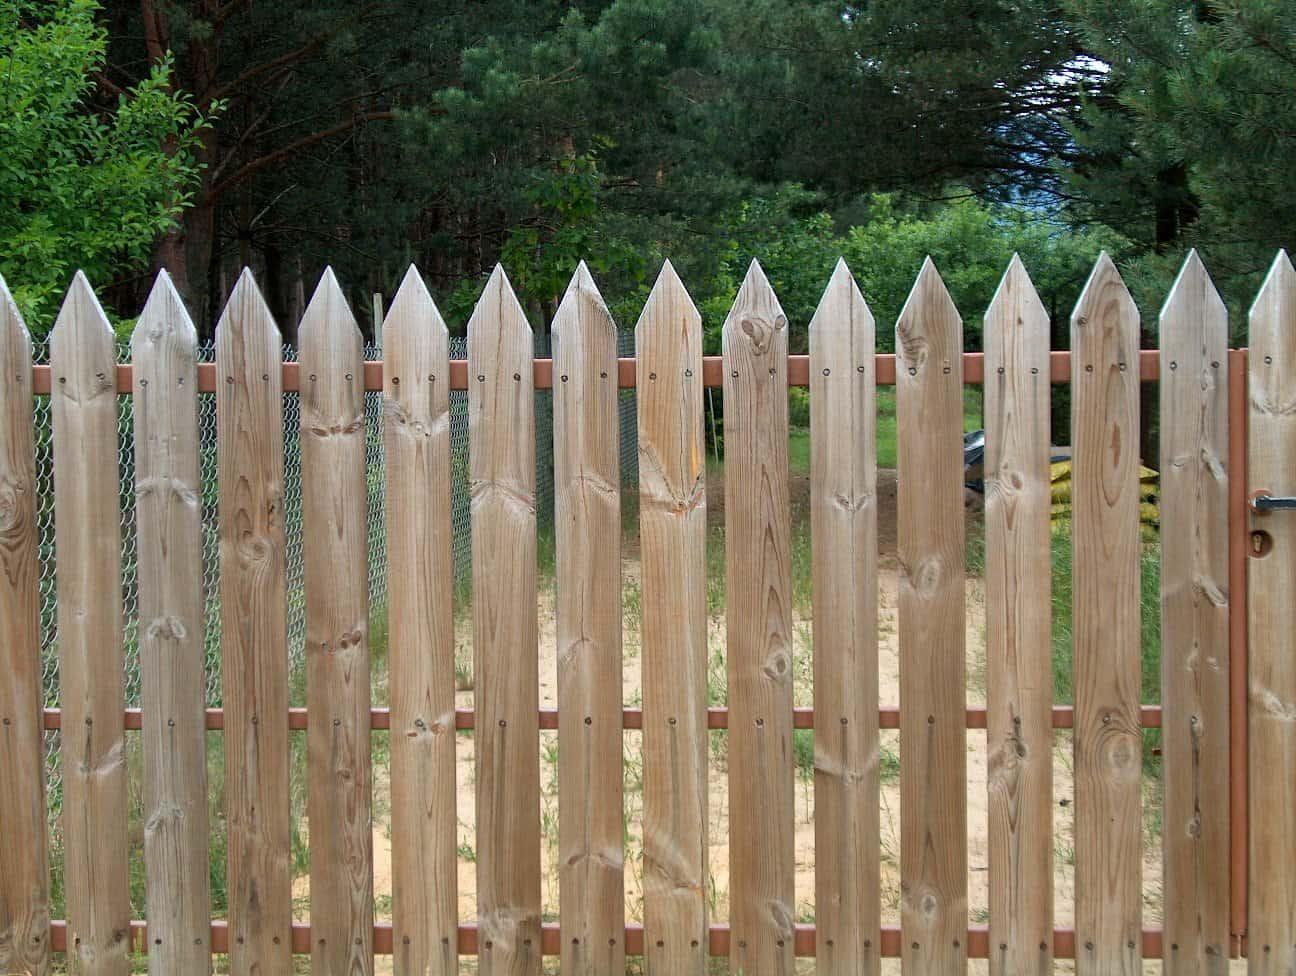 Best fence contractor in Irvine